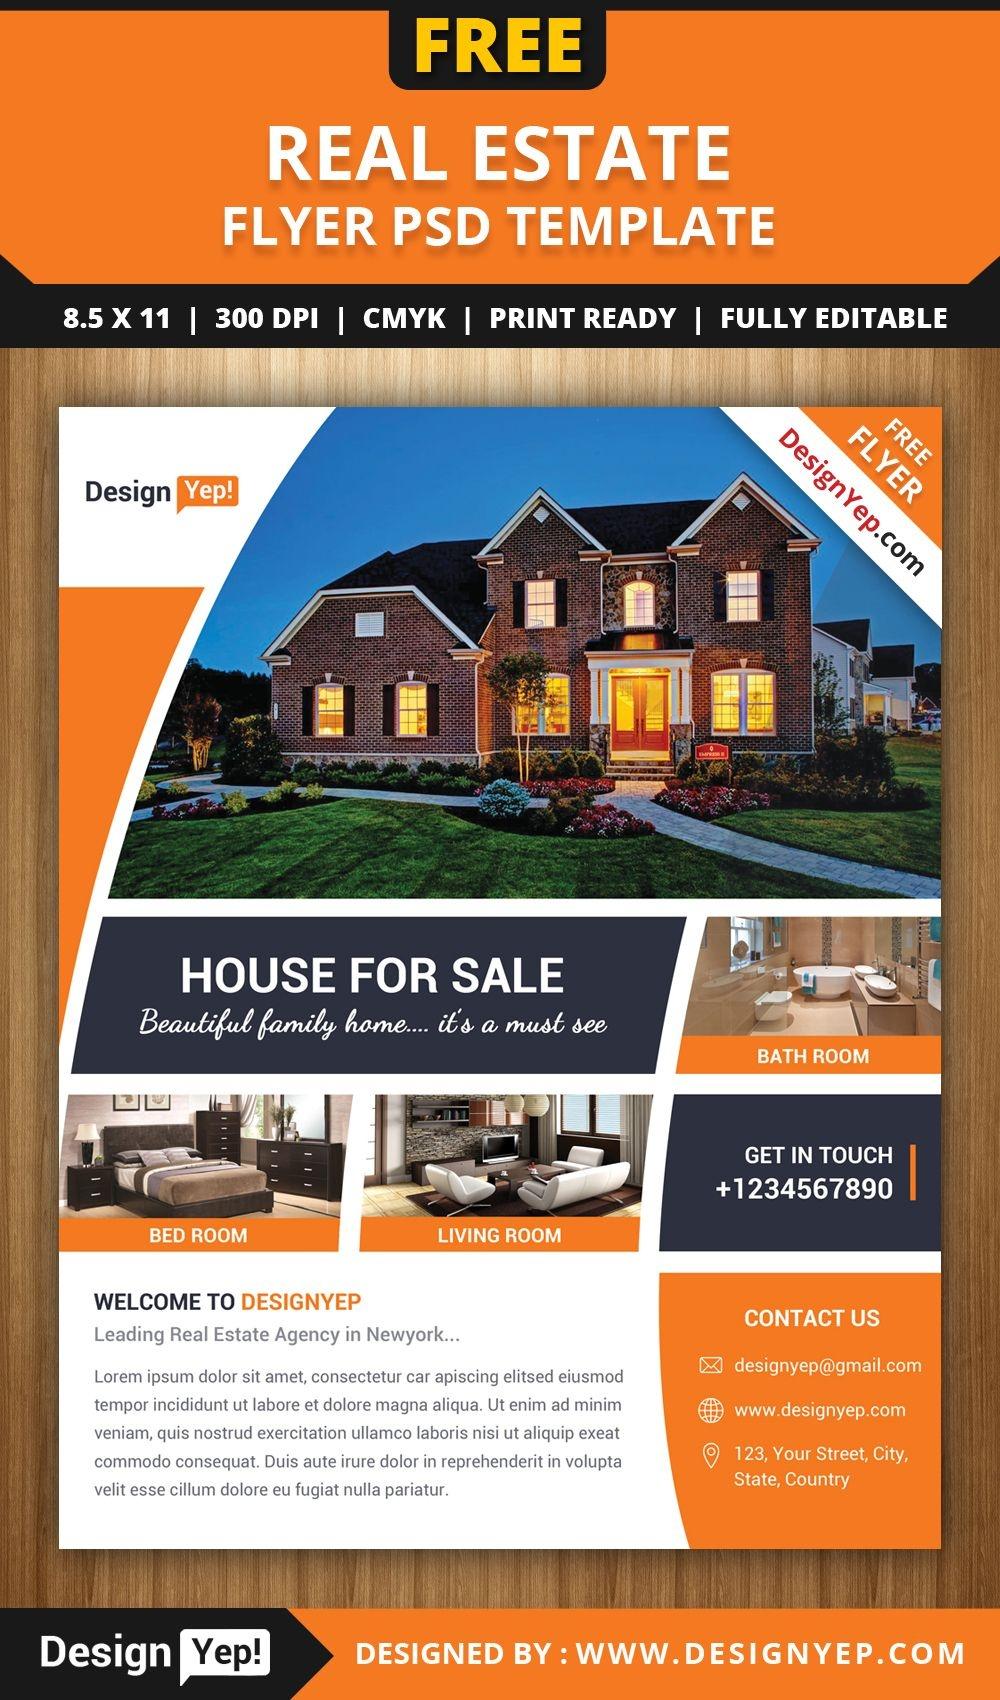 Pinsara On Design   Real Estate Flyer Template, Real Estate - Free Printable Real Estate Flyer Templates